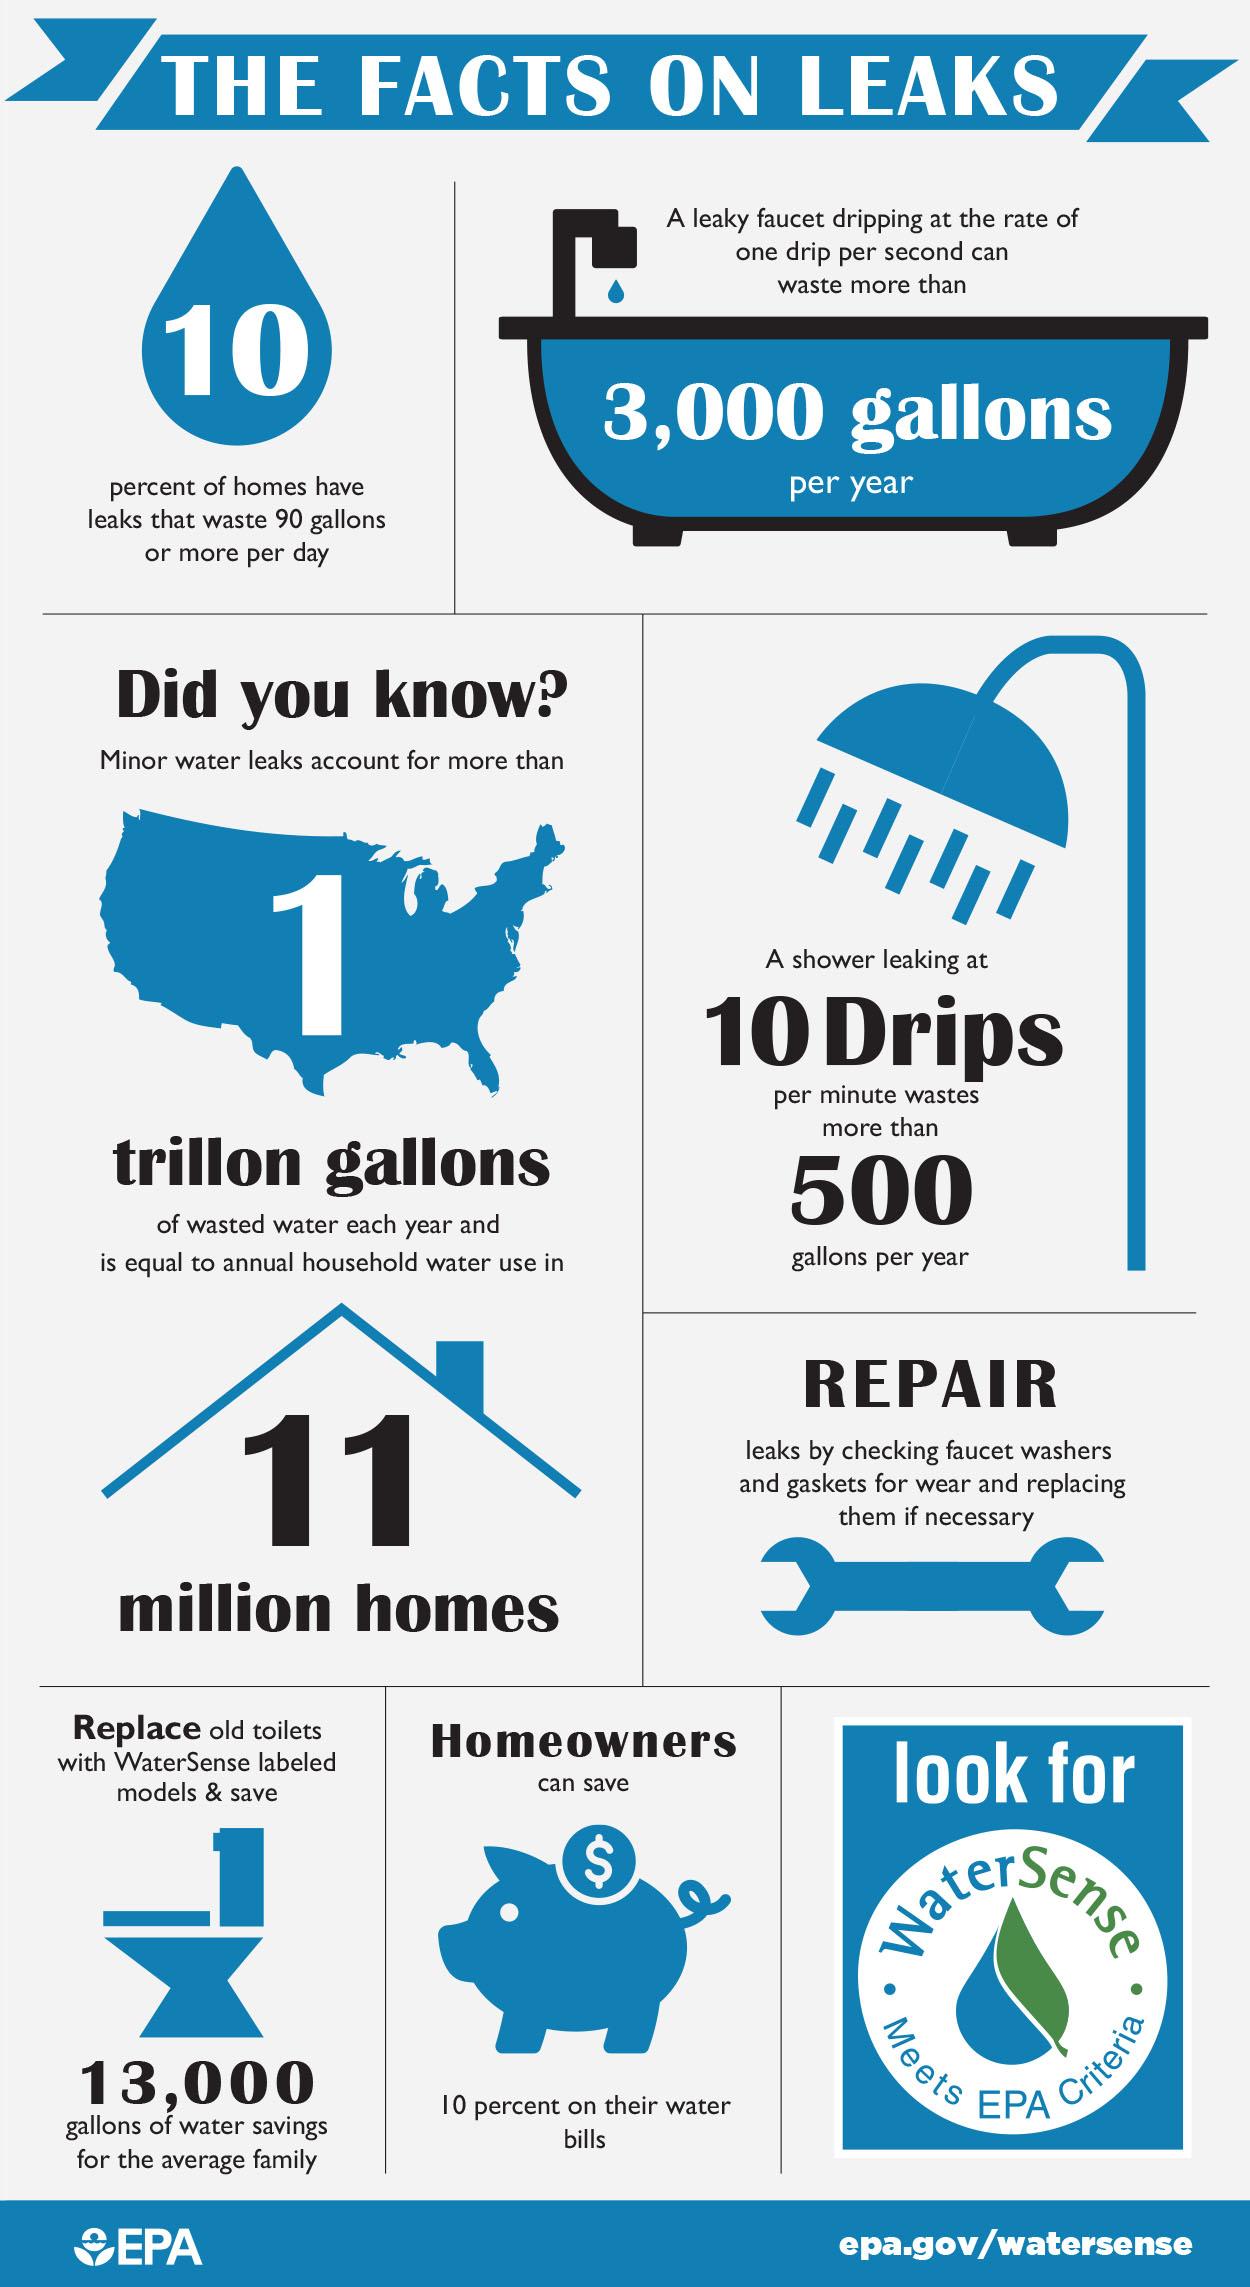 Fix A Leak Water Conservation Coalition Of Santa Cruz County